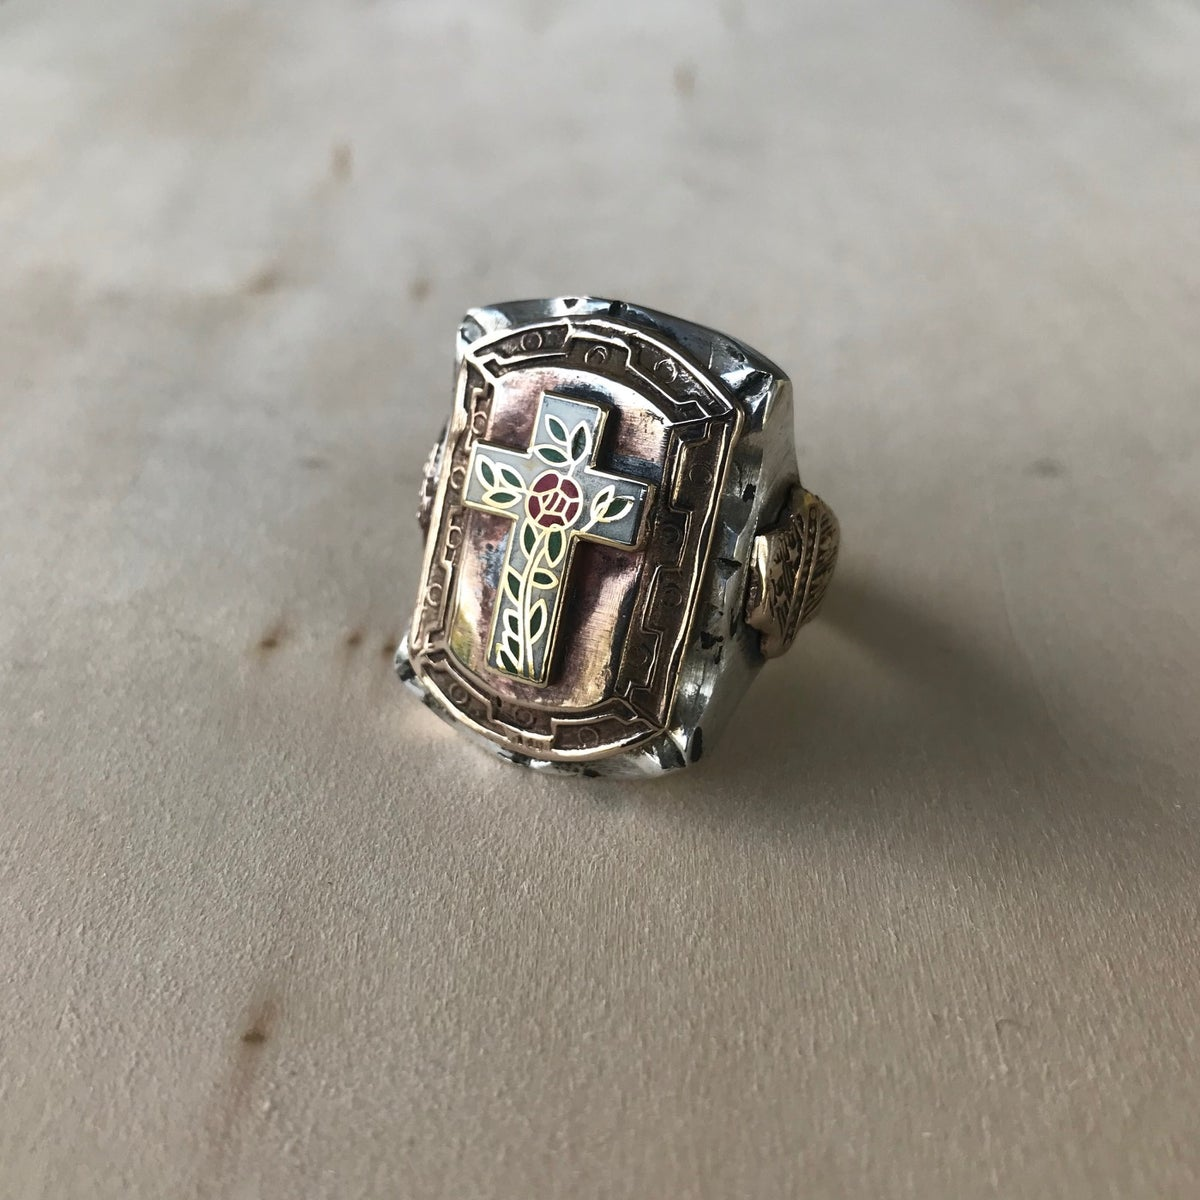 Image of ROSE CROSS RING